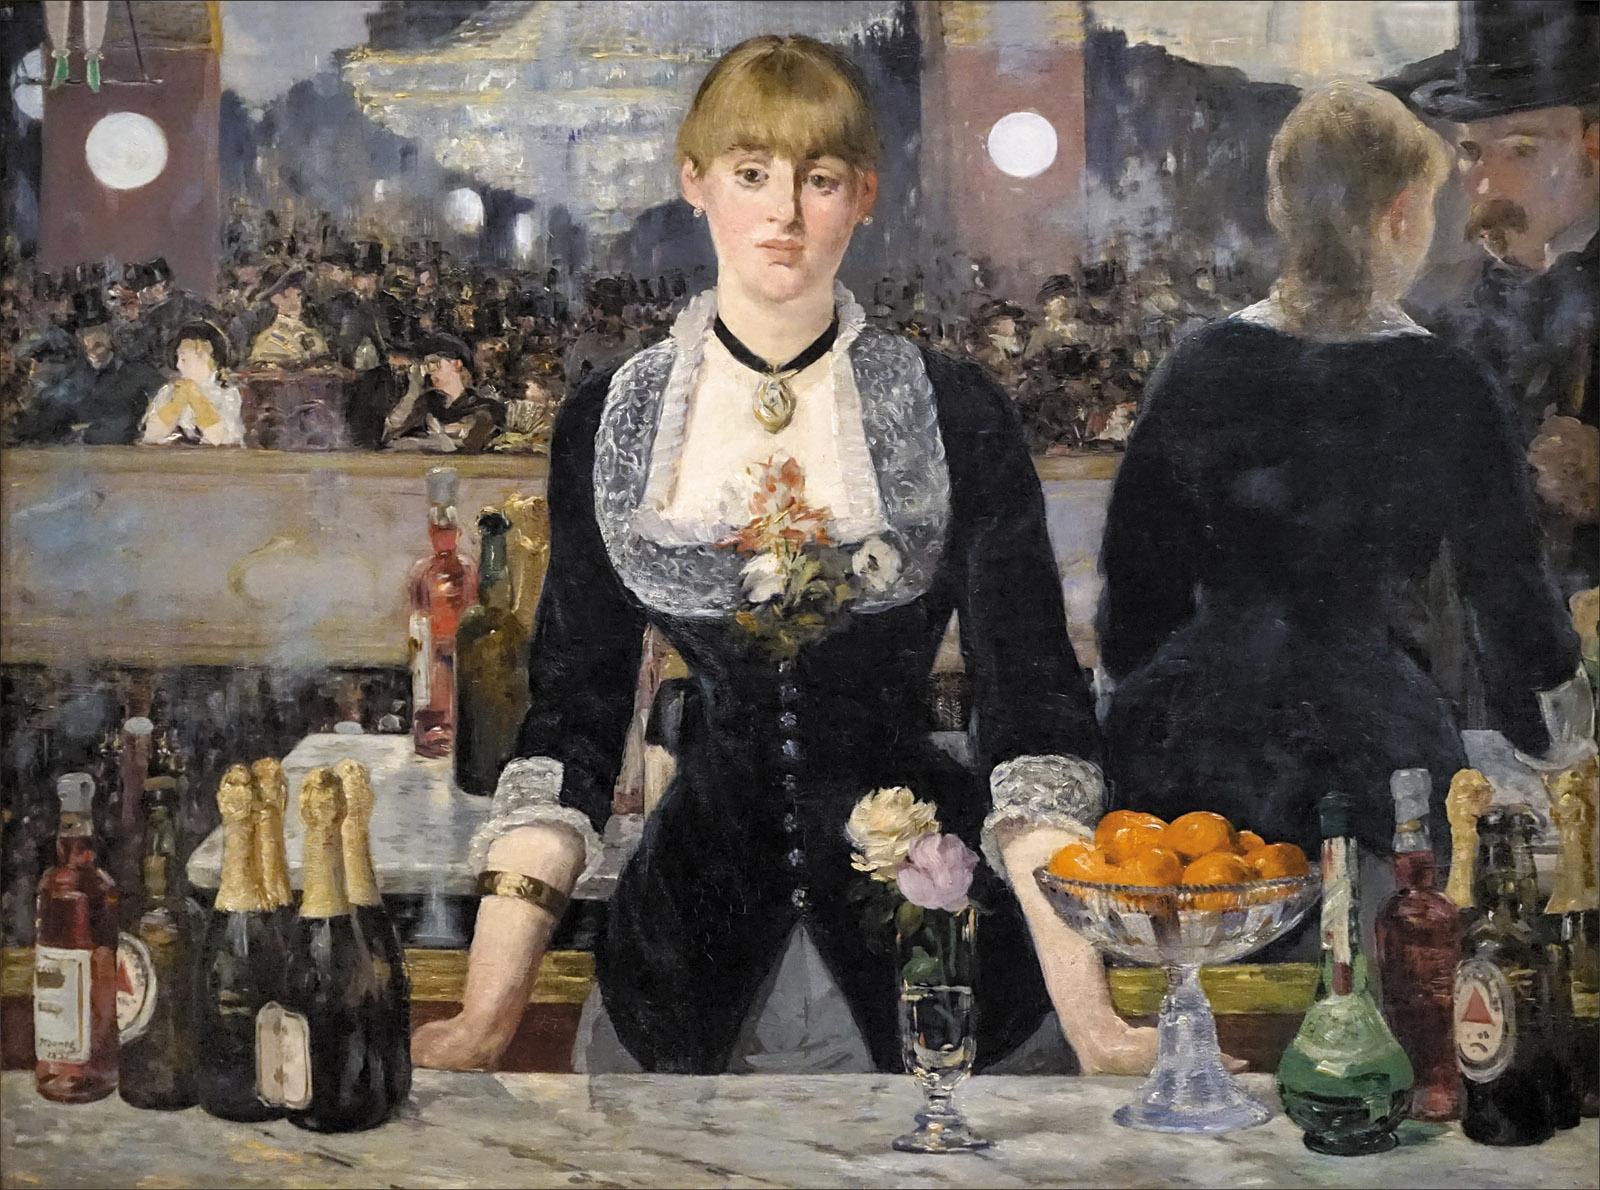 A Bar at the Folies-Bergère; painting by Édouard Manet